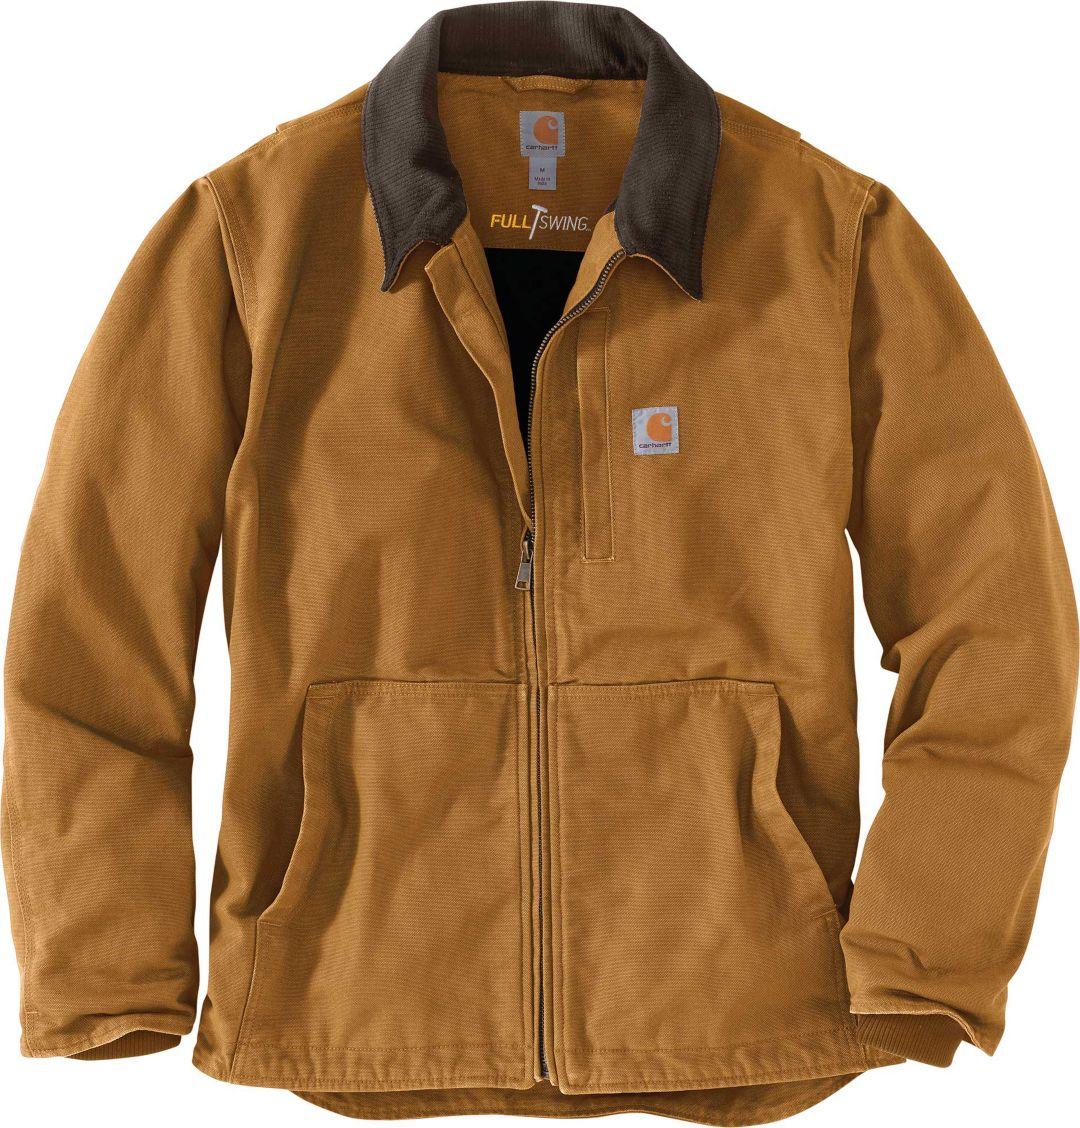 2aabcc4634 Carhartt Men's Full Swing Armstrong Jacket